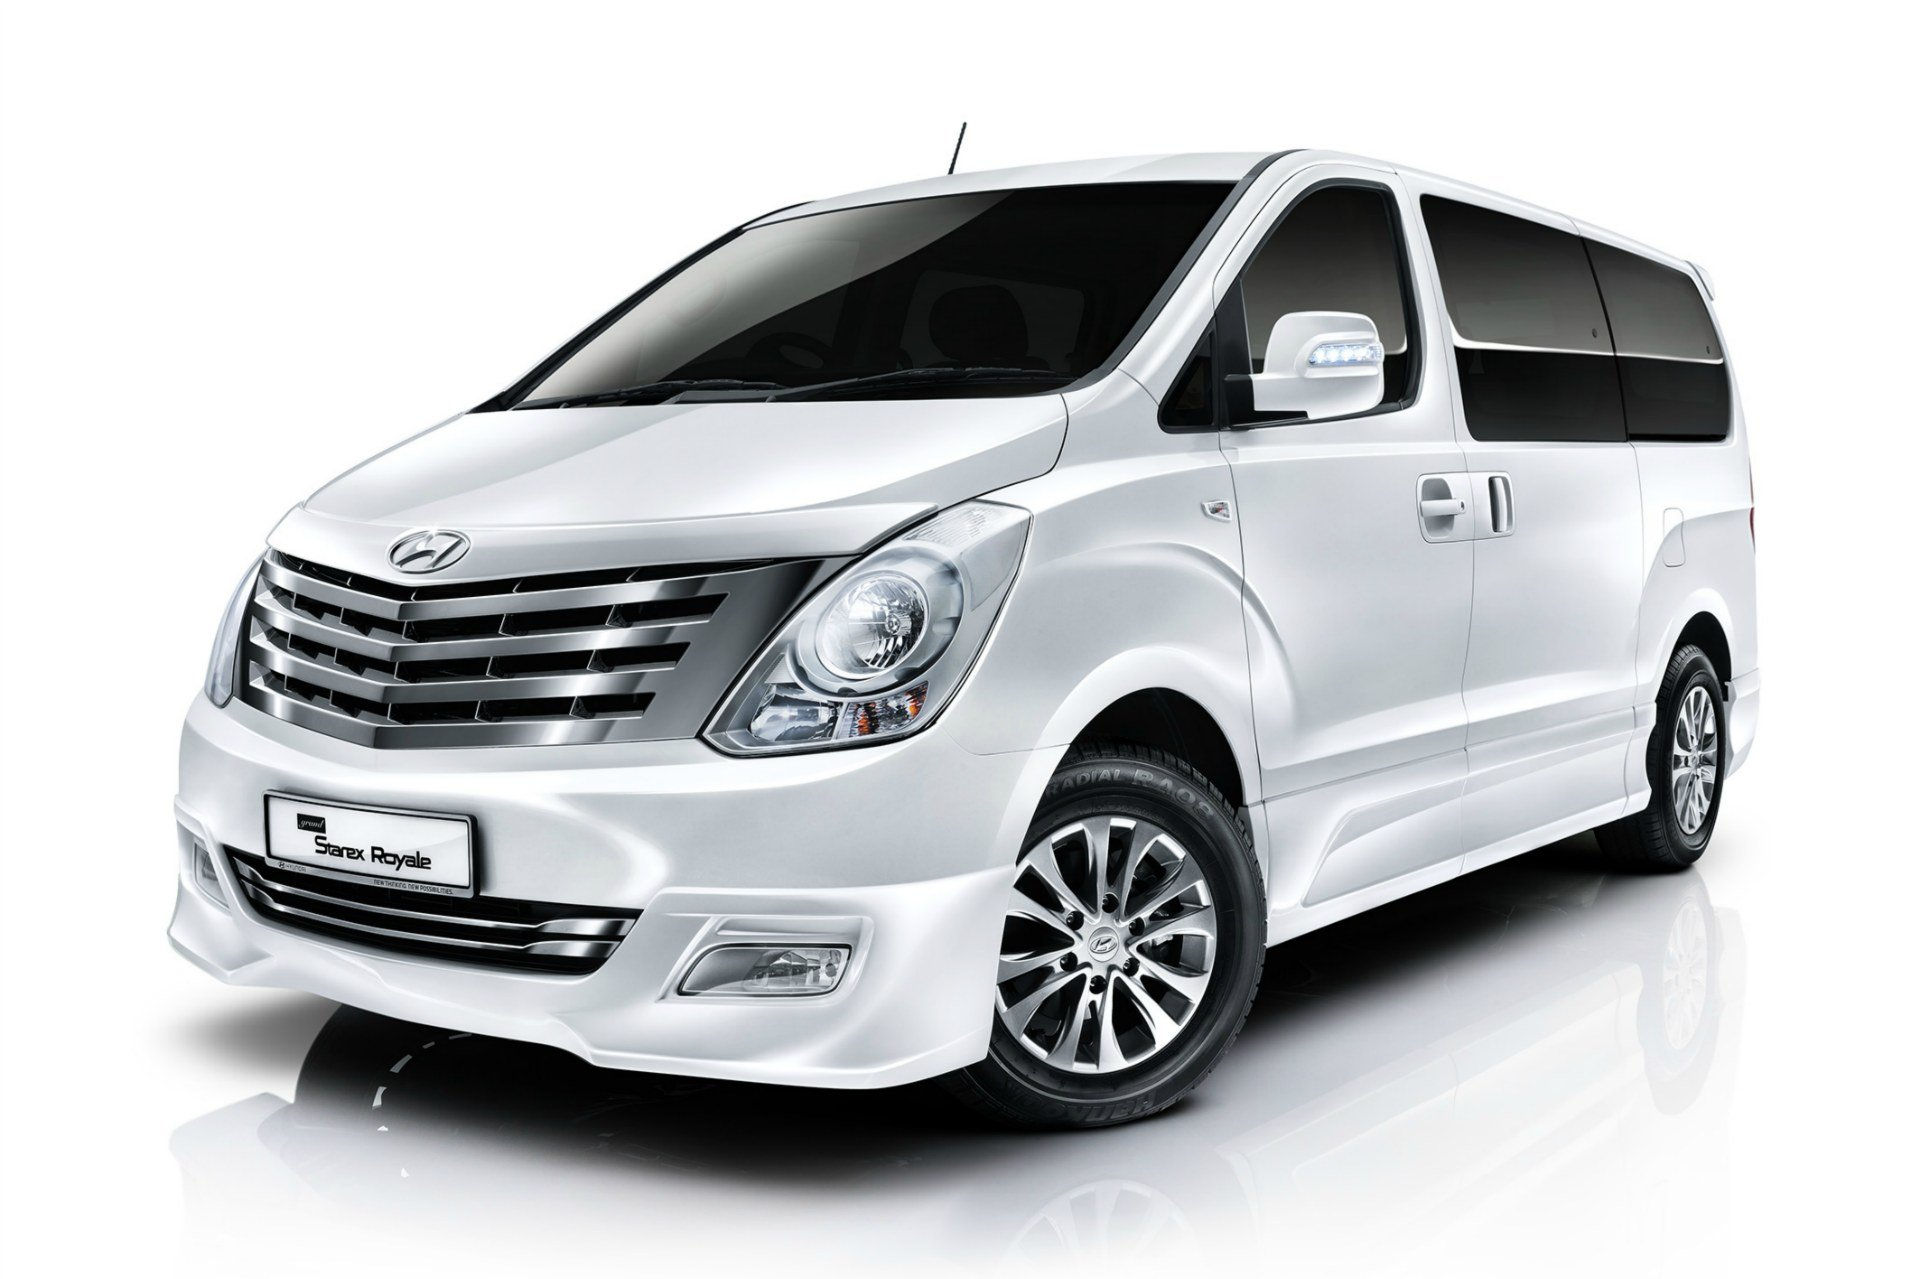 hyundai-starex-cargo-2013-models-197237